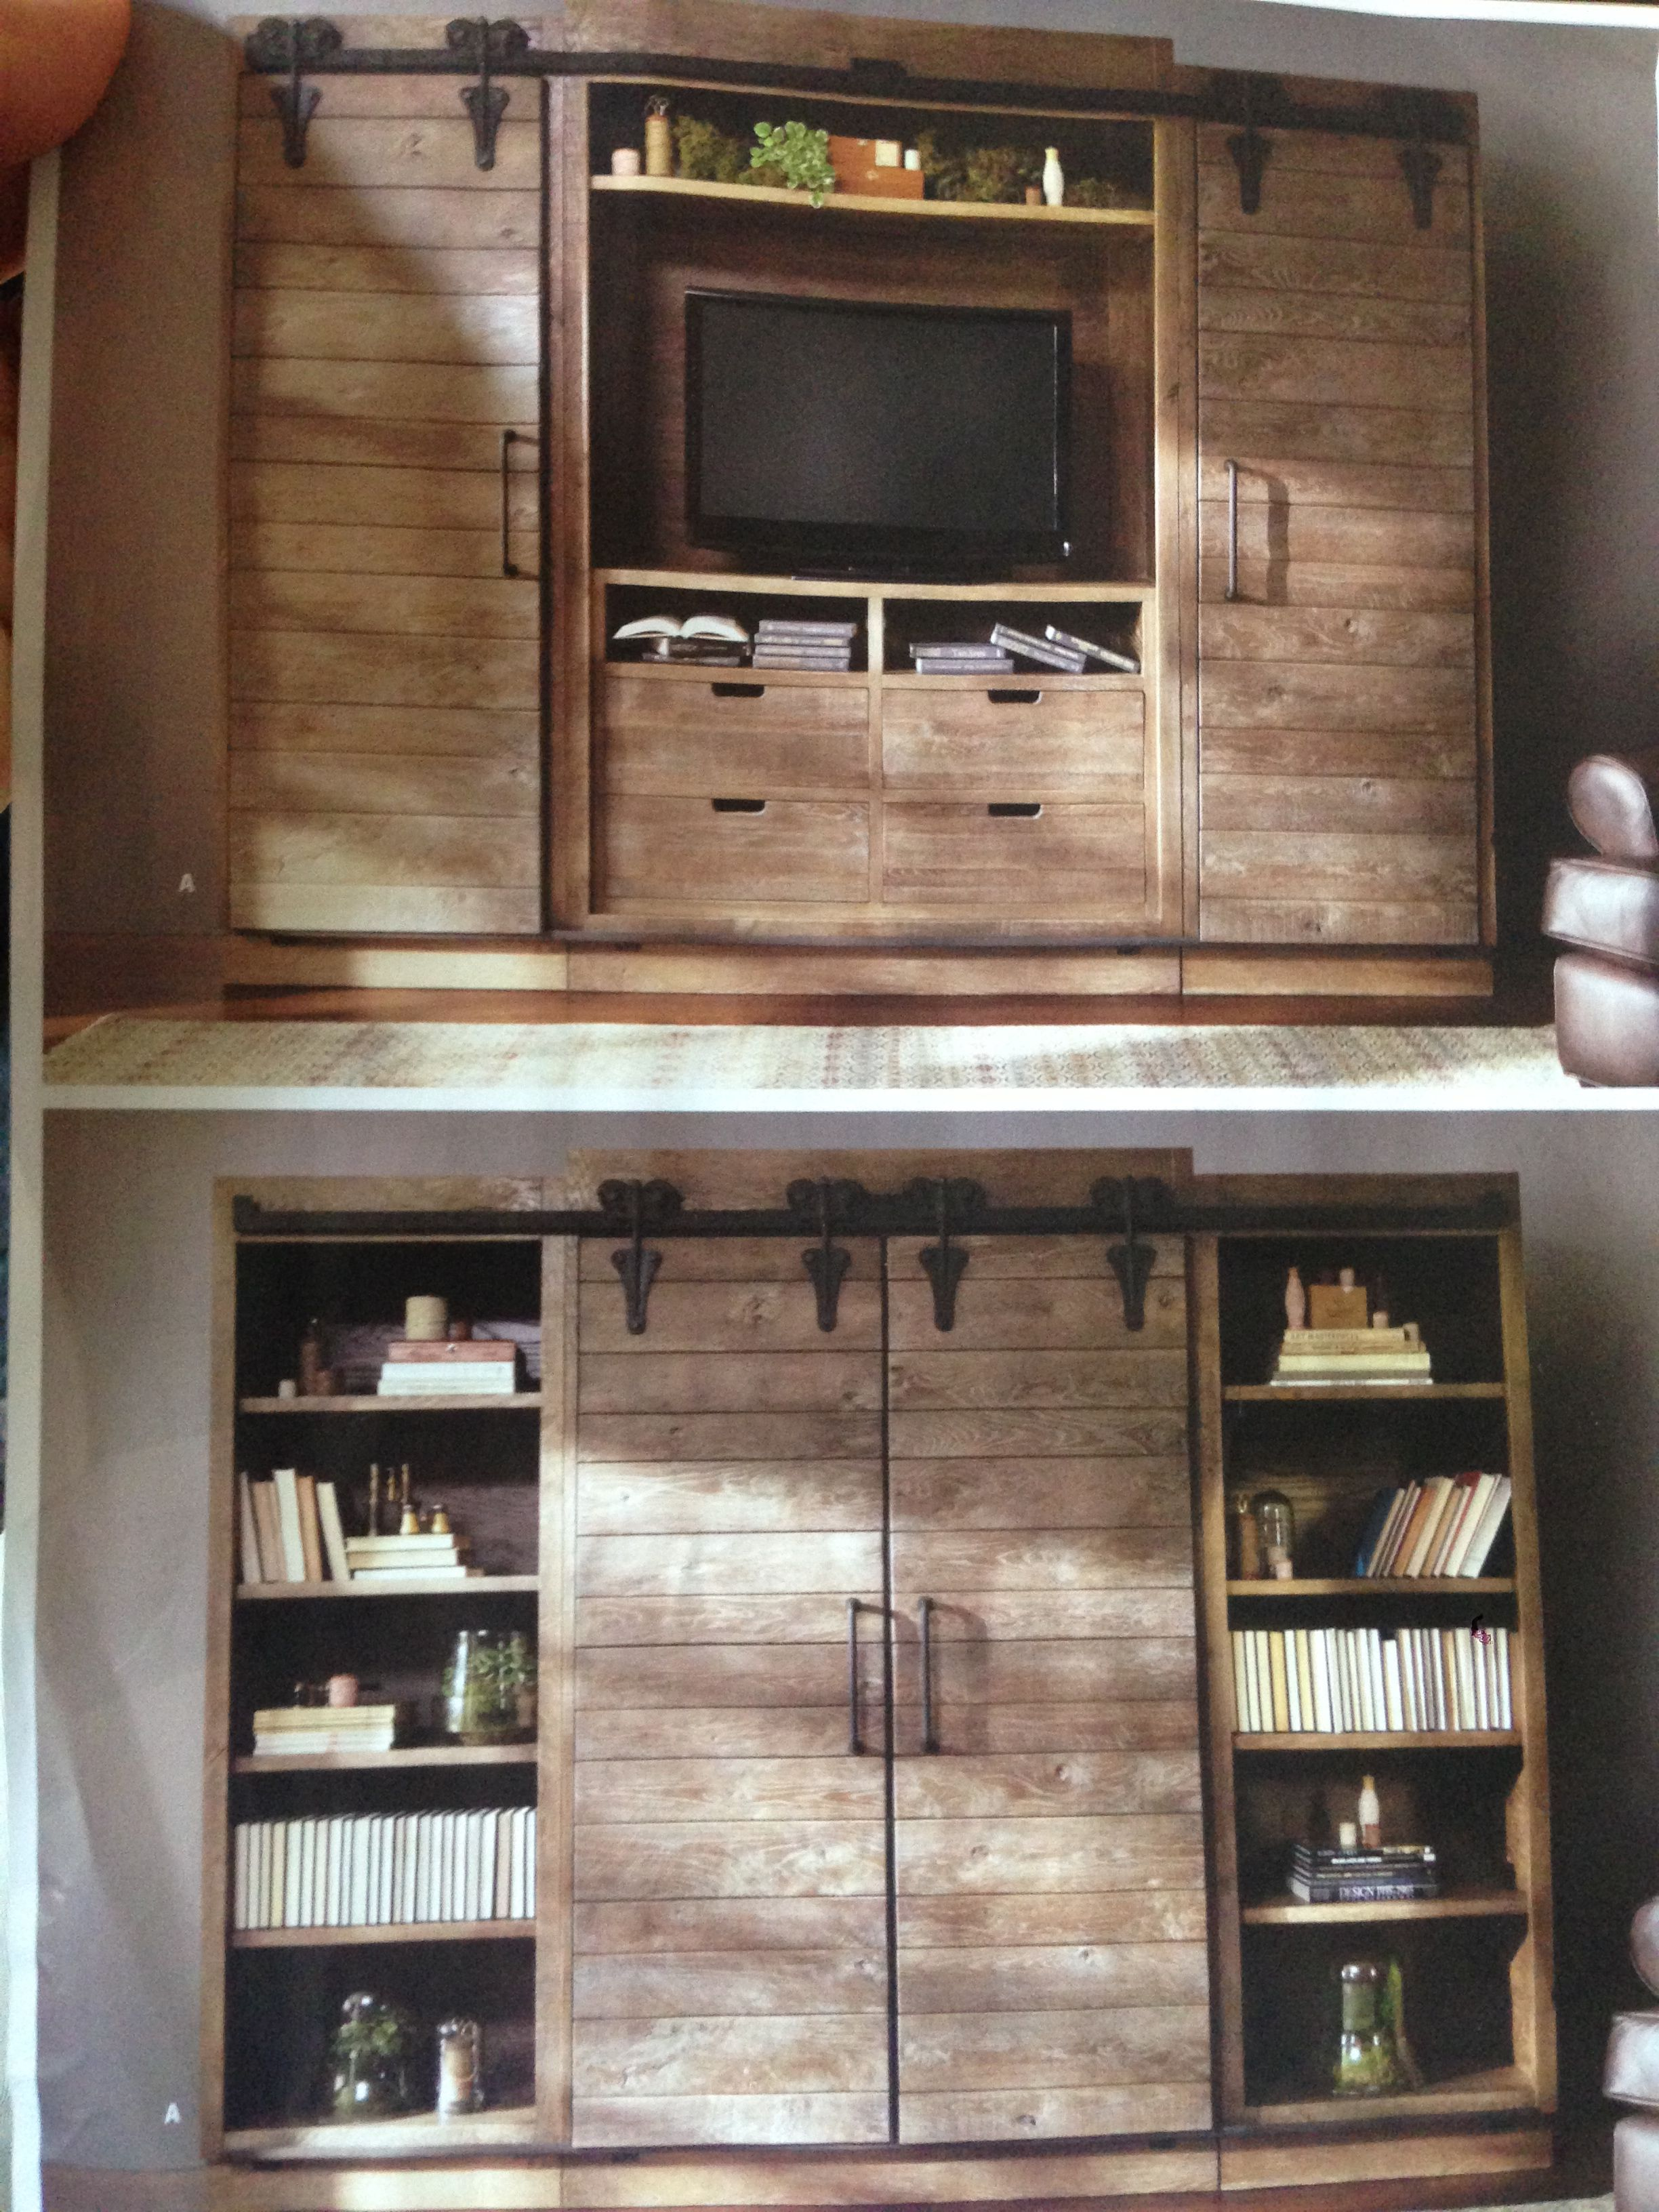 likes entertainment center i like the barn sliding doors ak. Black Bedroom Furniture Sets. Home Design Ideas